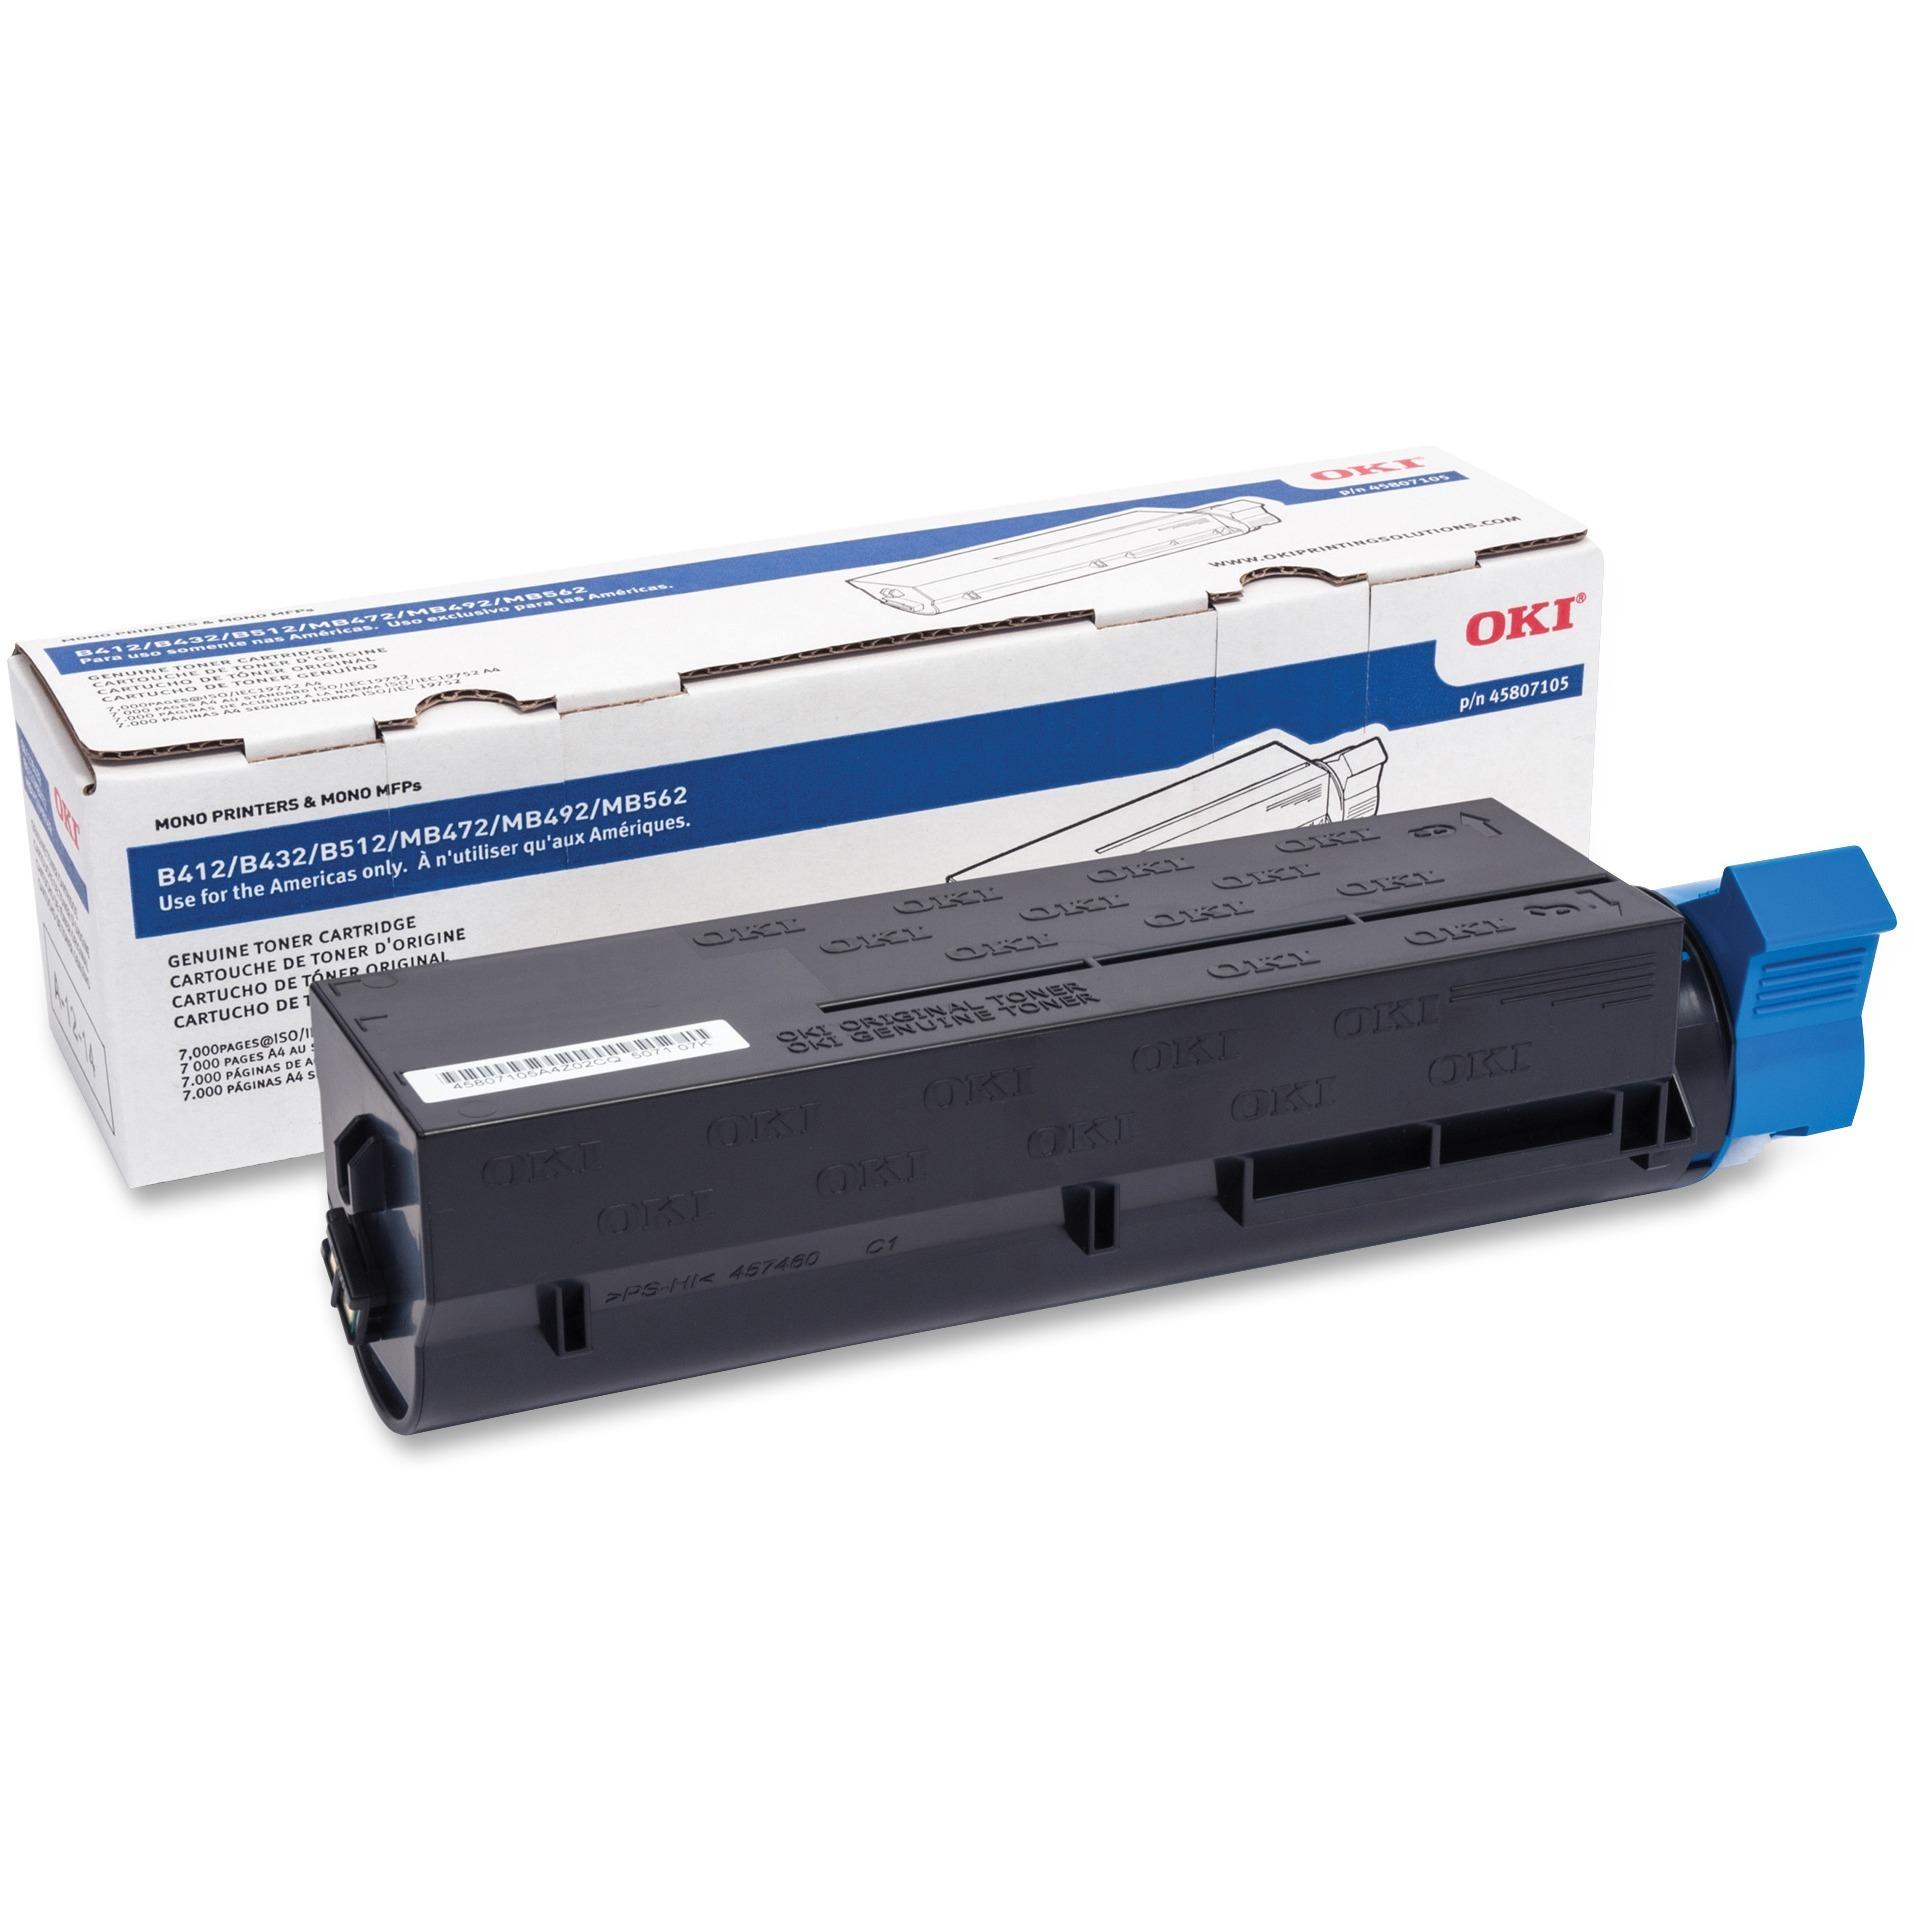 Oki, OKI45807105, B412/B432/MB472 High-Yield Toner Cartridge, 1 Each